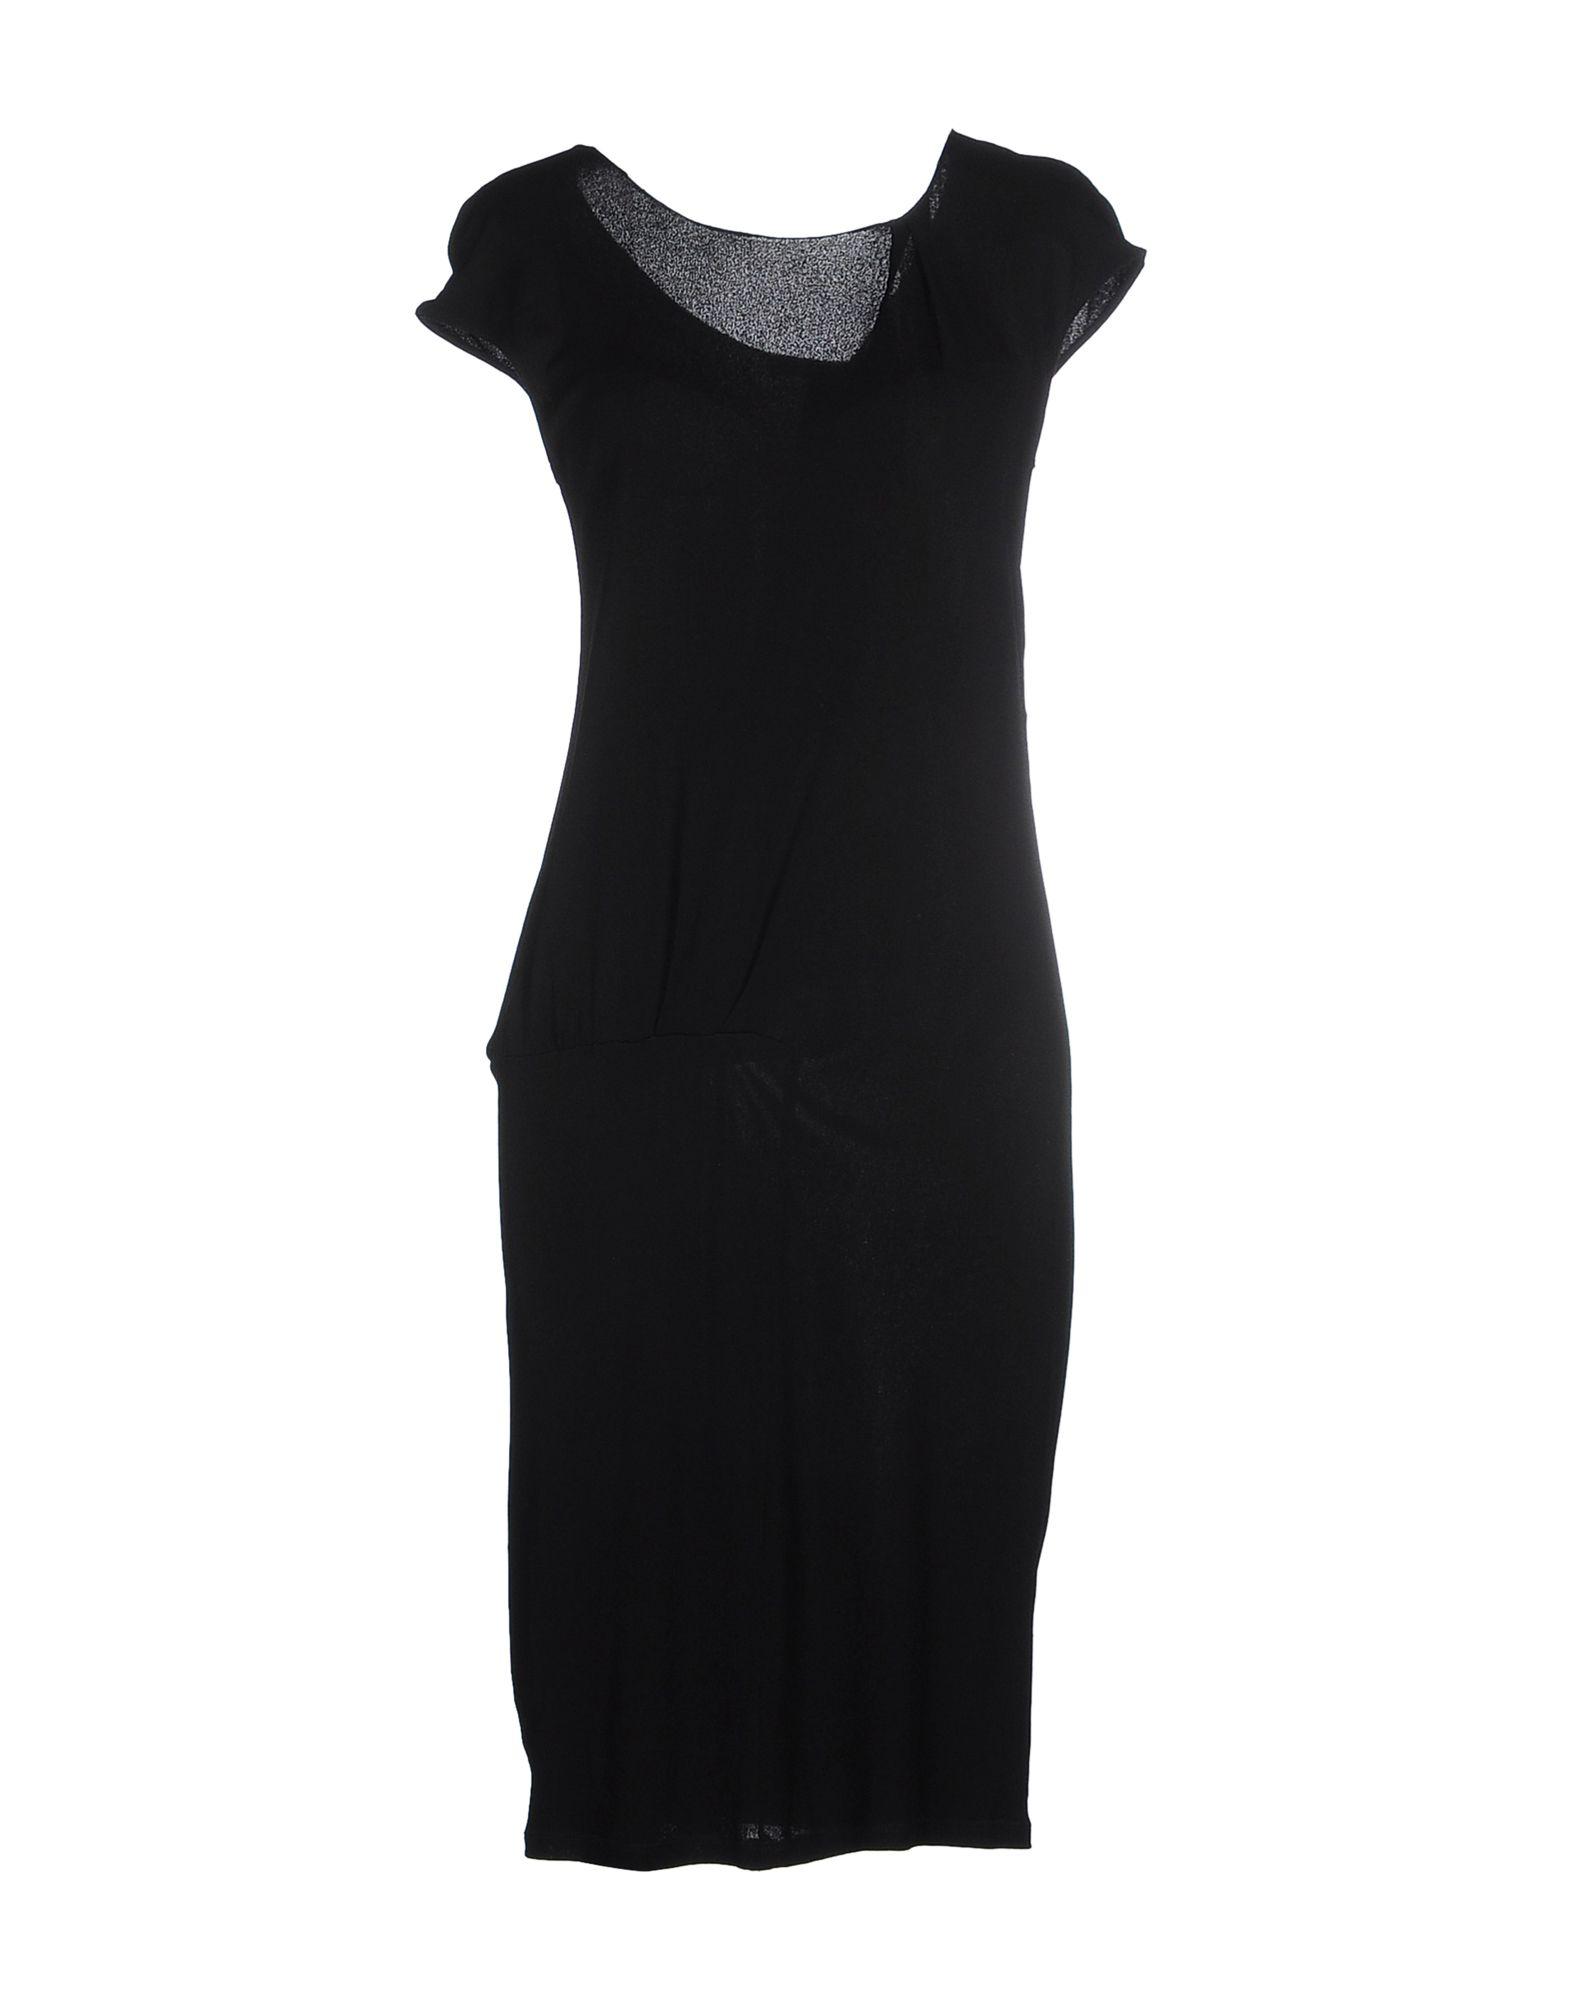 VIONNET Короткое платье vionnet vionnet платье из шелка sf 145254